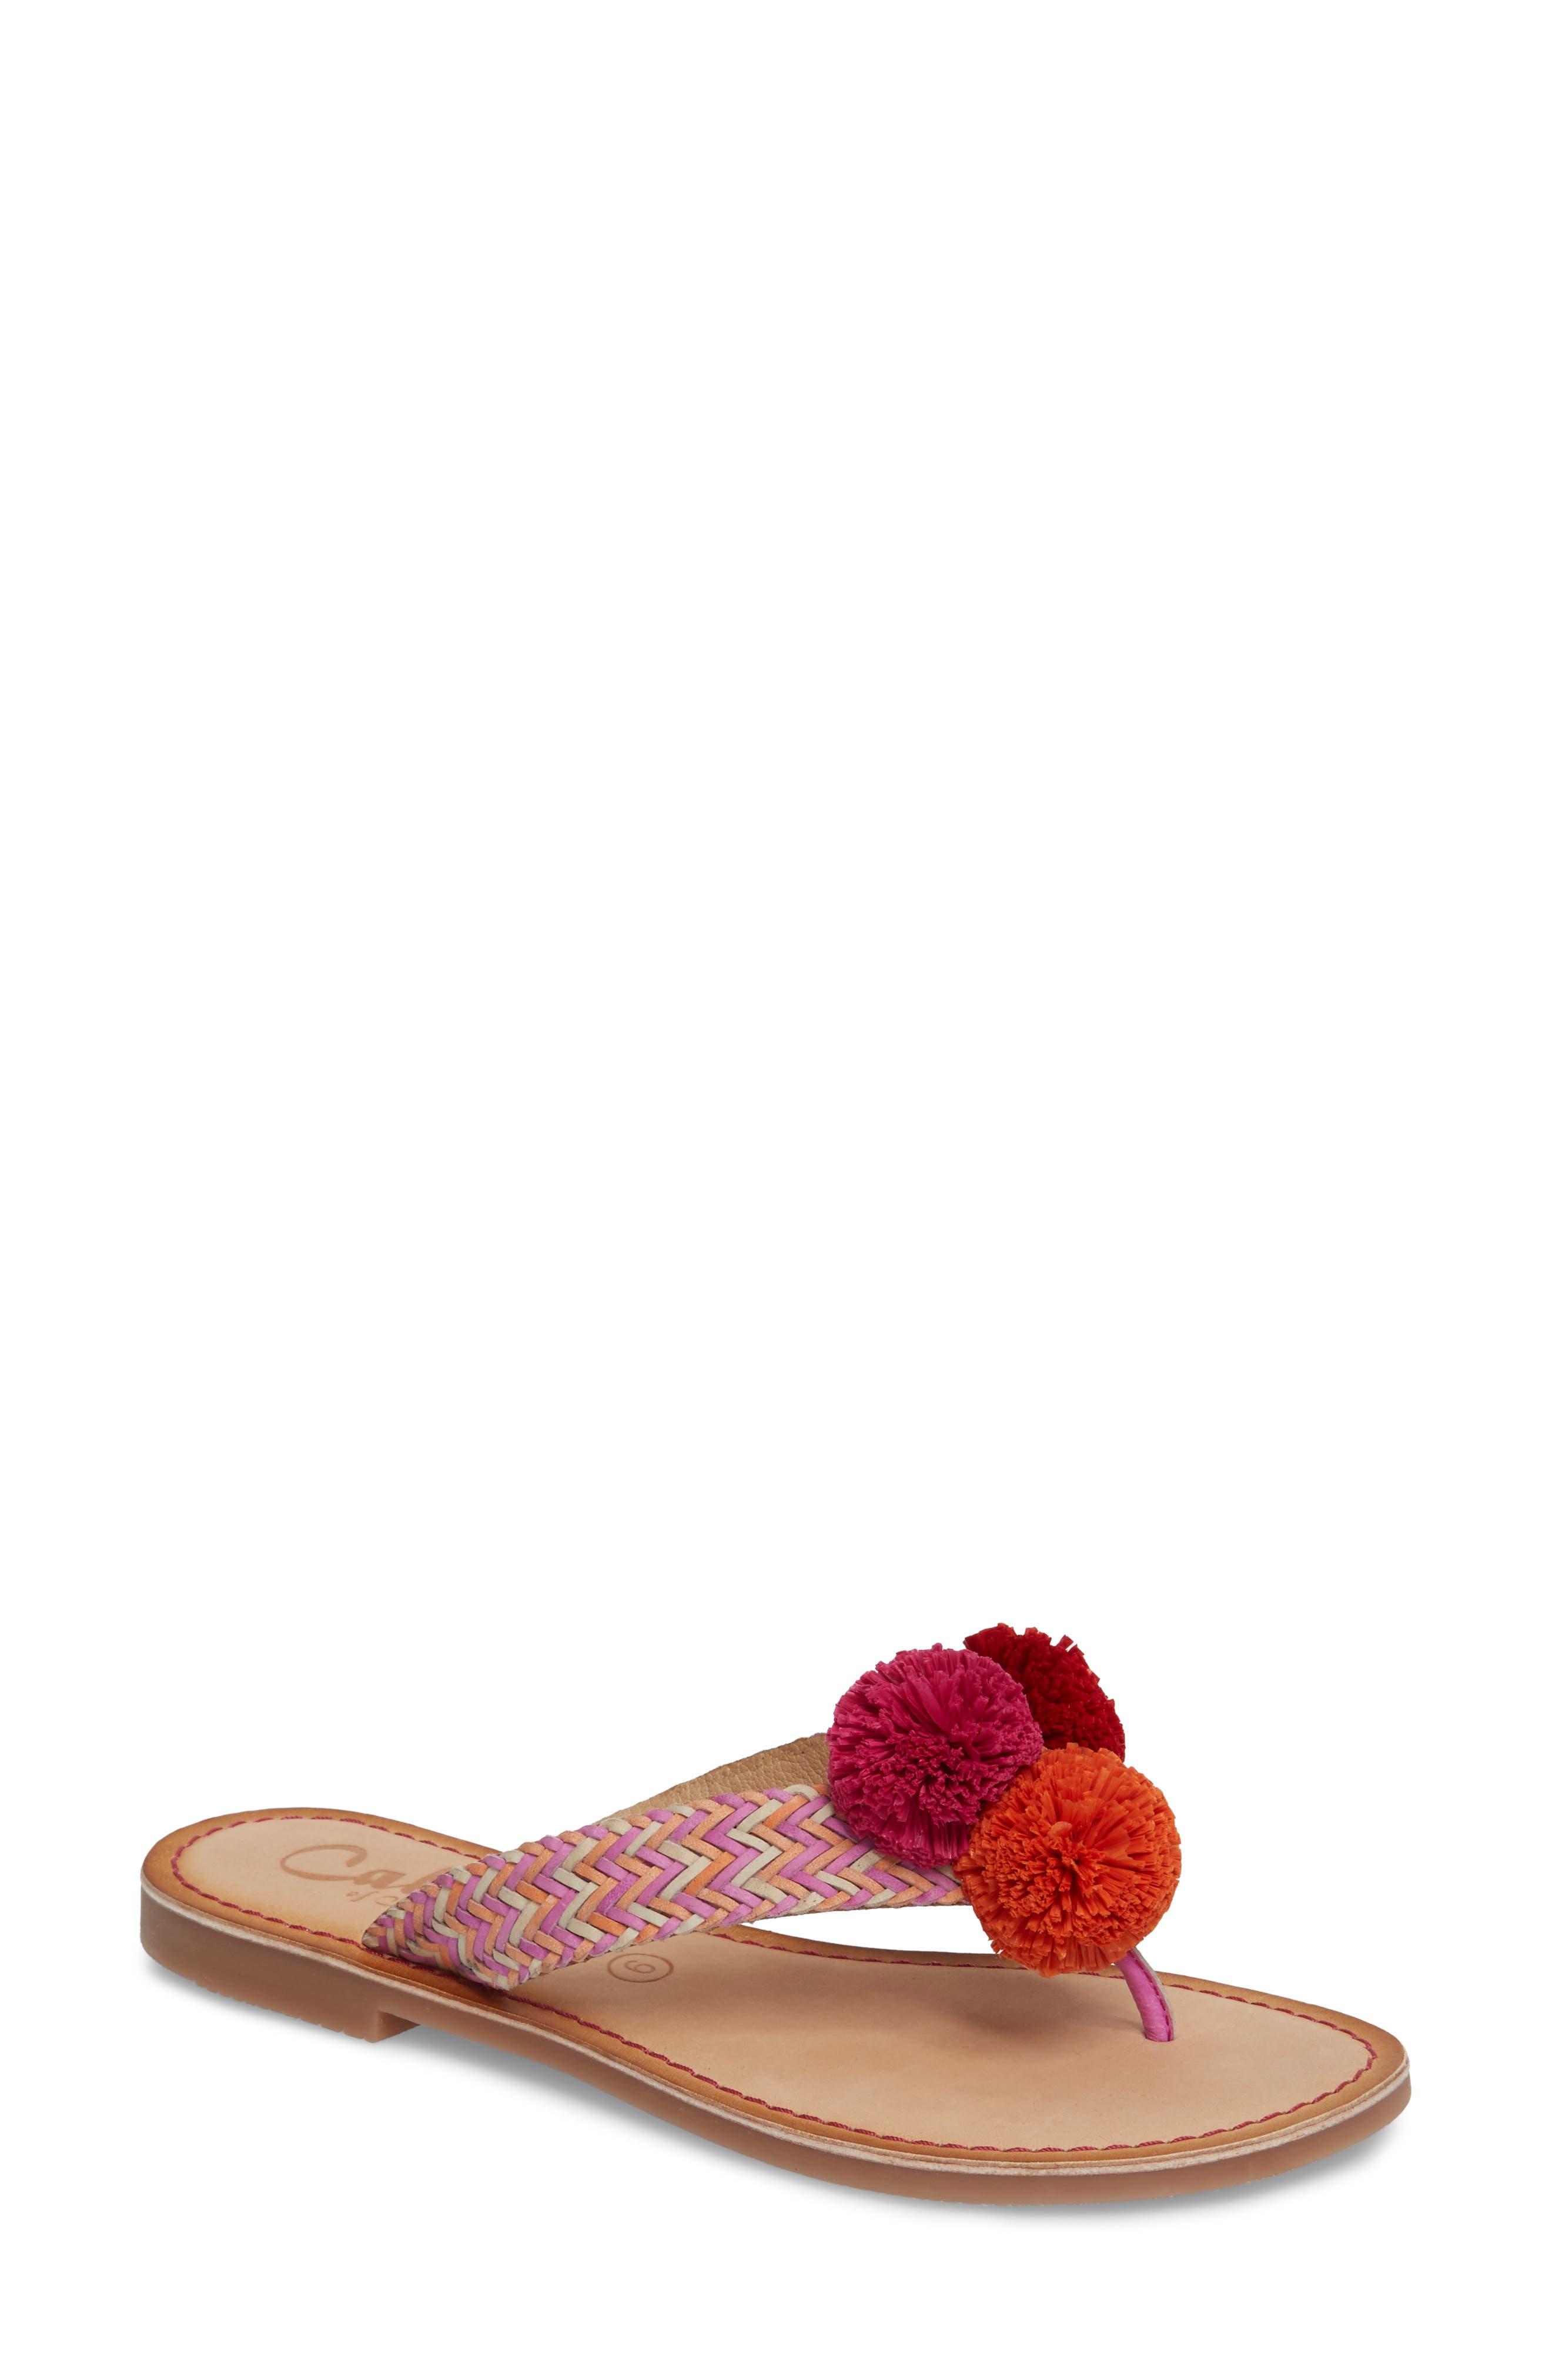 Callisto Pomm Flip Flop (Women)